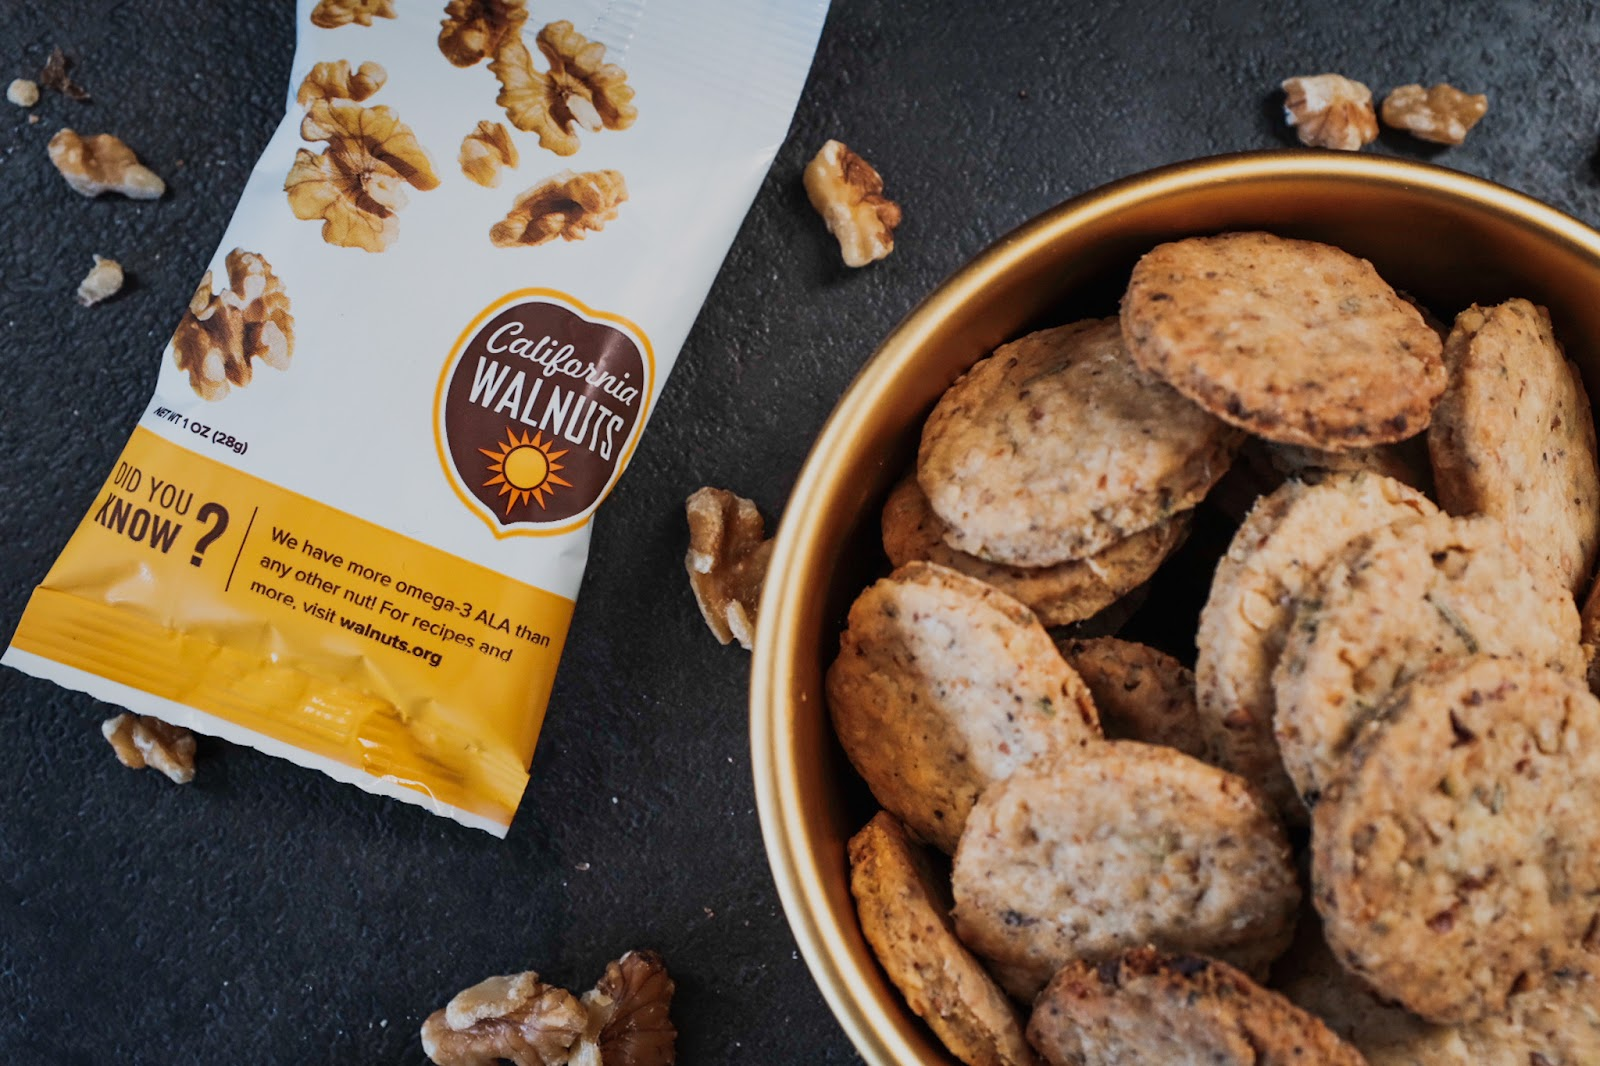 Rosemary Walnut Crackers featuring California Walnuts | Local Food Rocks